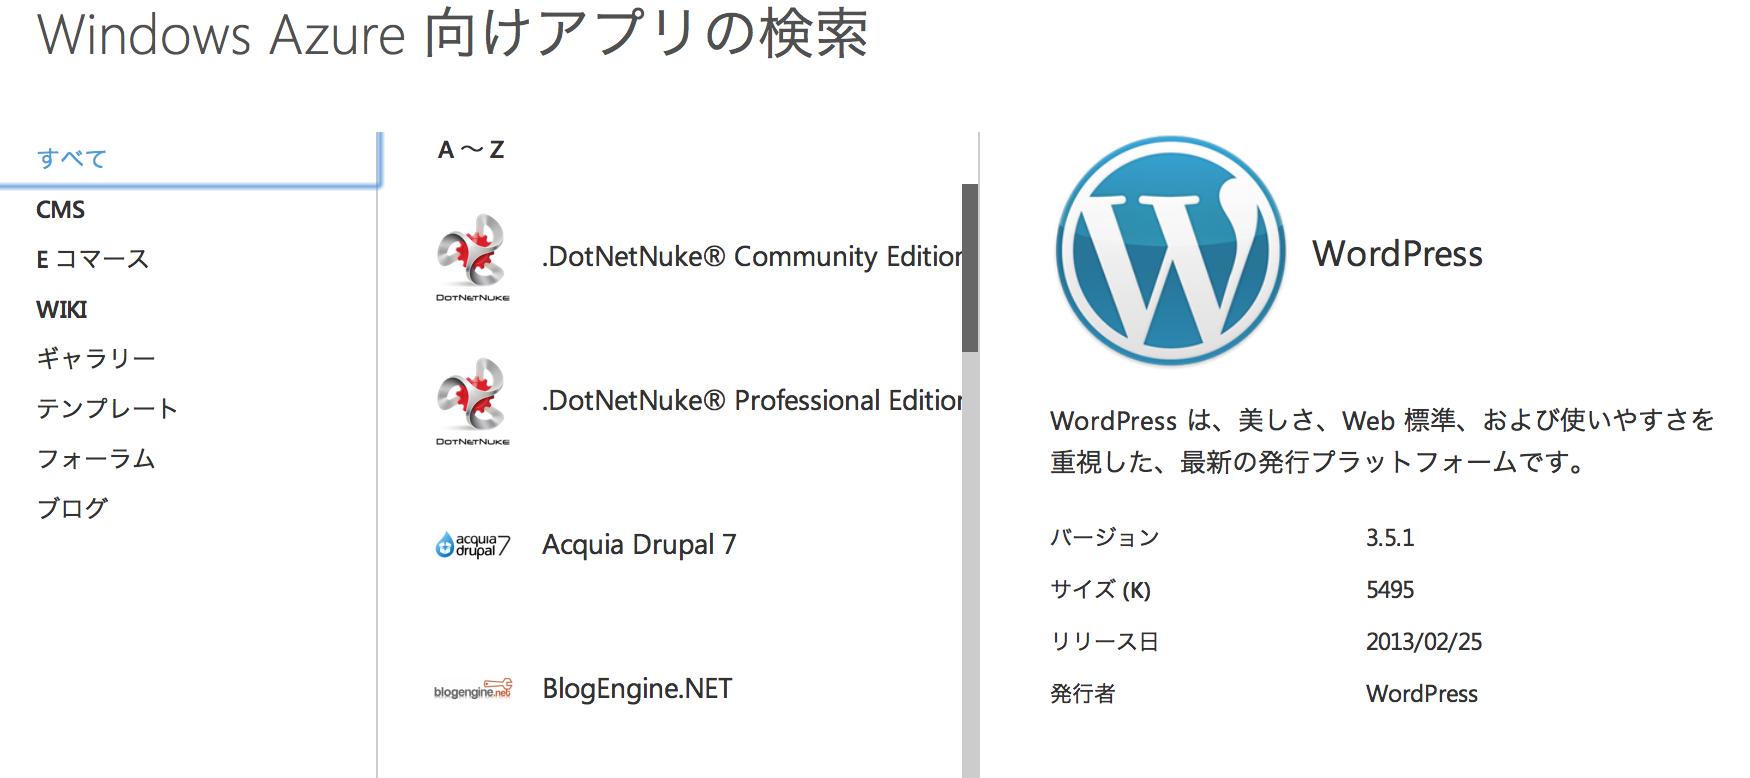 Windows Azure 向けアプリの検索